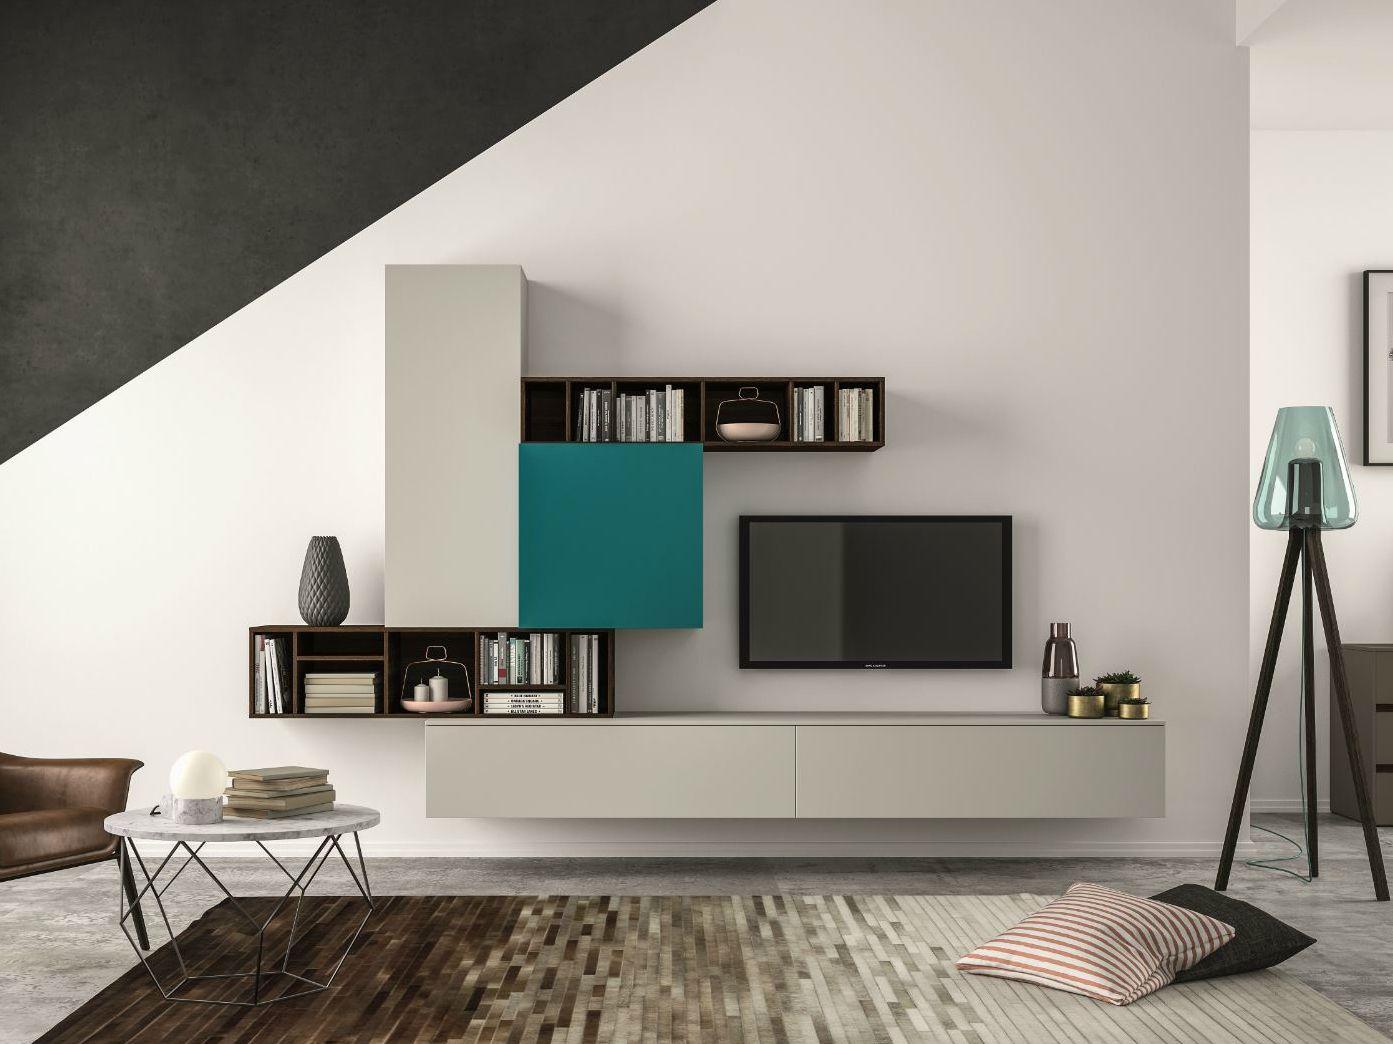 Mueble modular de pared composable slim 101 by dall agnese dise o imago design massimo rosa - Dall agnese mobili classici ...